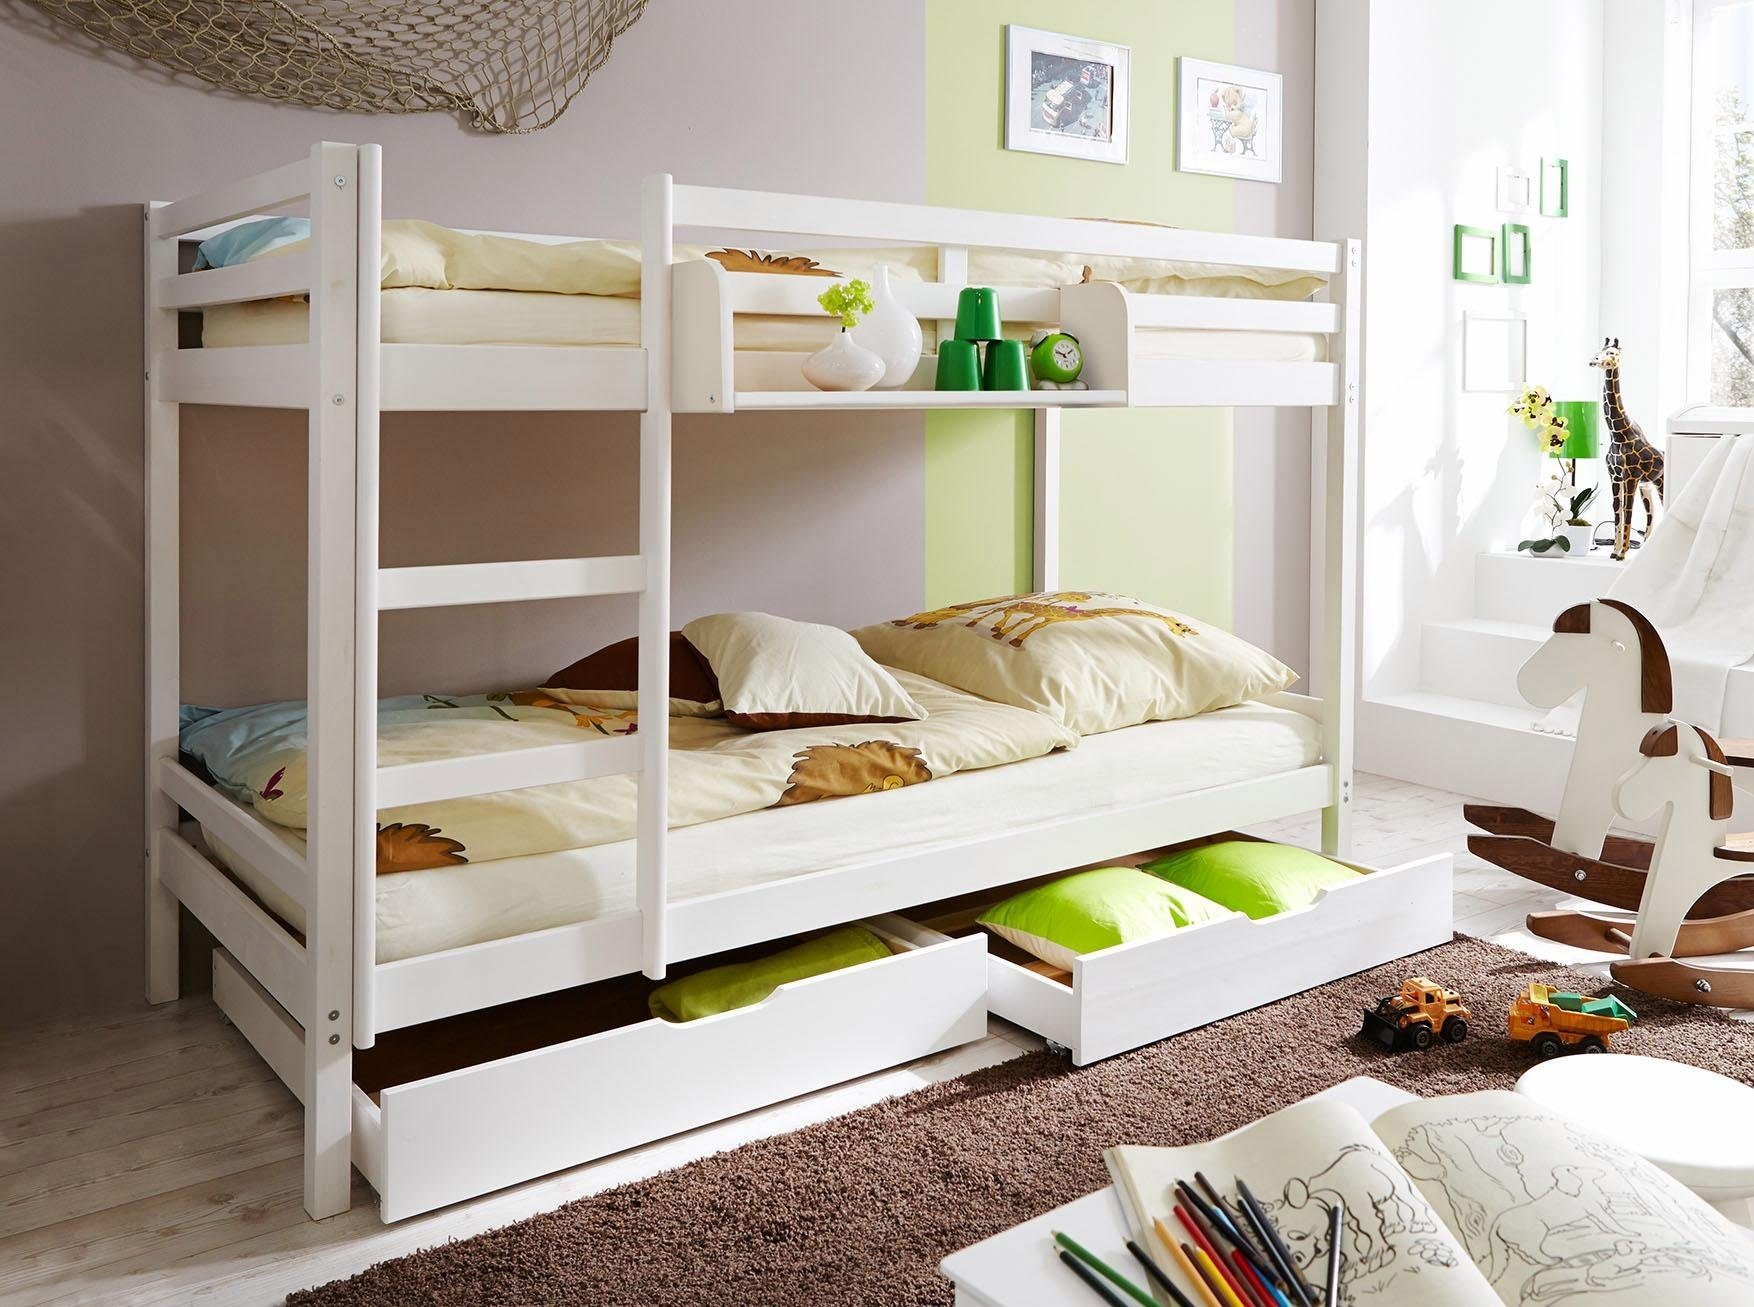 Ticaa Etagenbett : Ticaa einzel etagenbett kiefer erni« kaufen otto